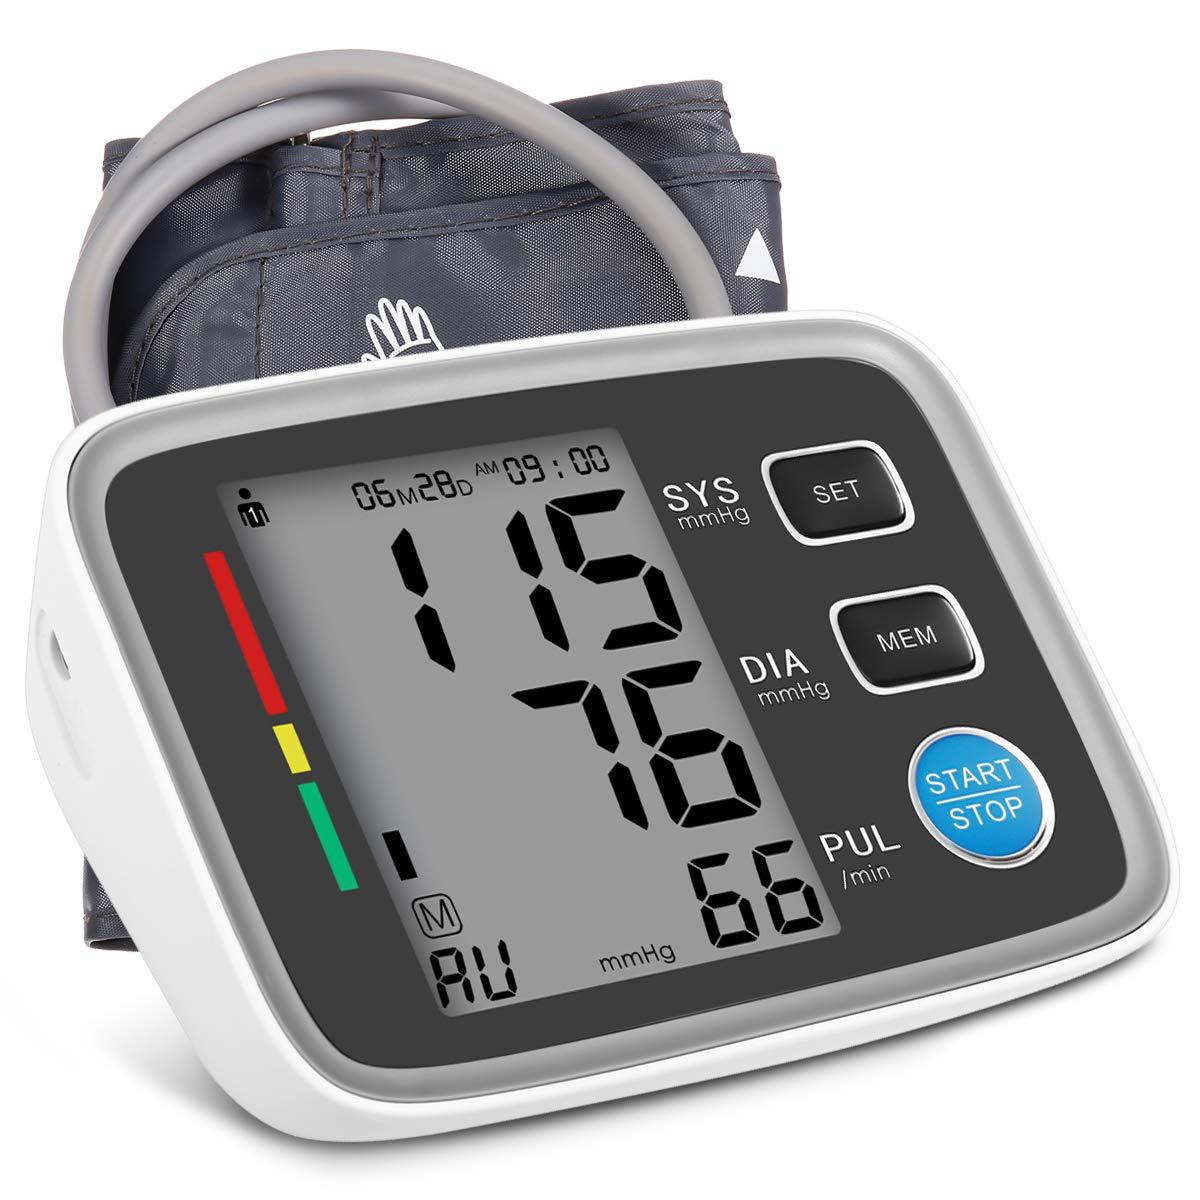 Hizek Blutdruckmessgerät Oberarm Digitale Blutdruck Messgeräte